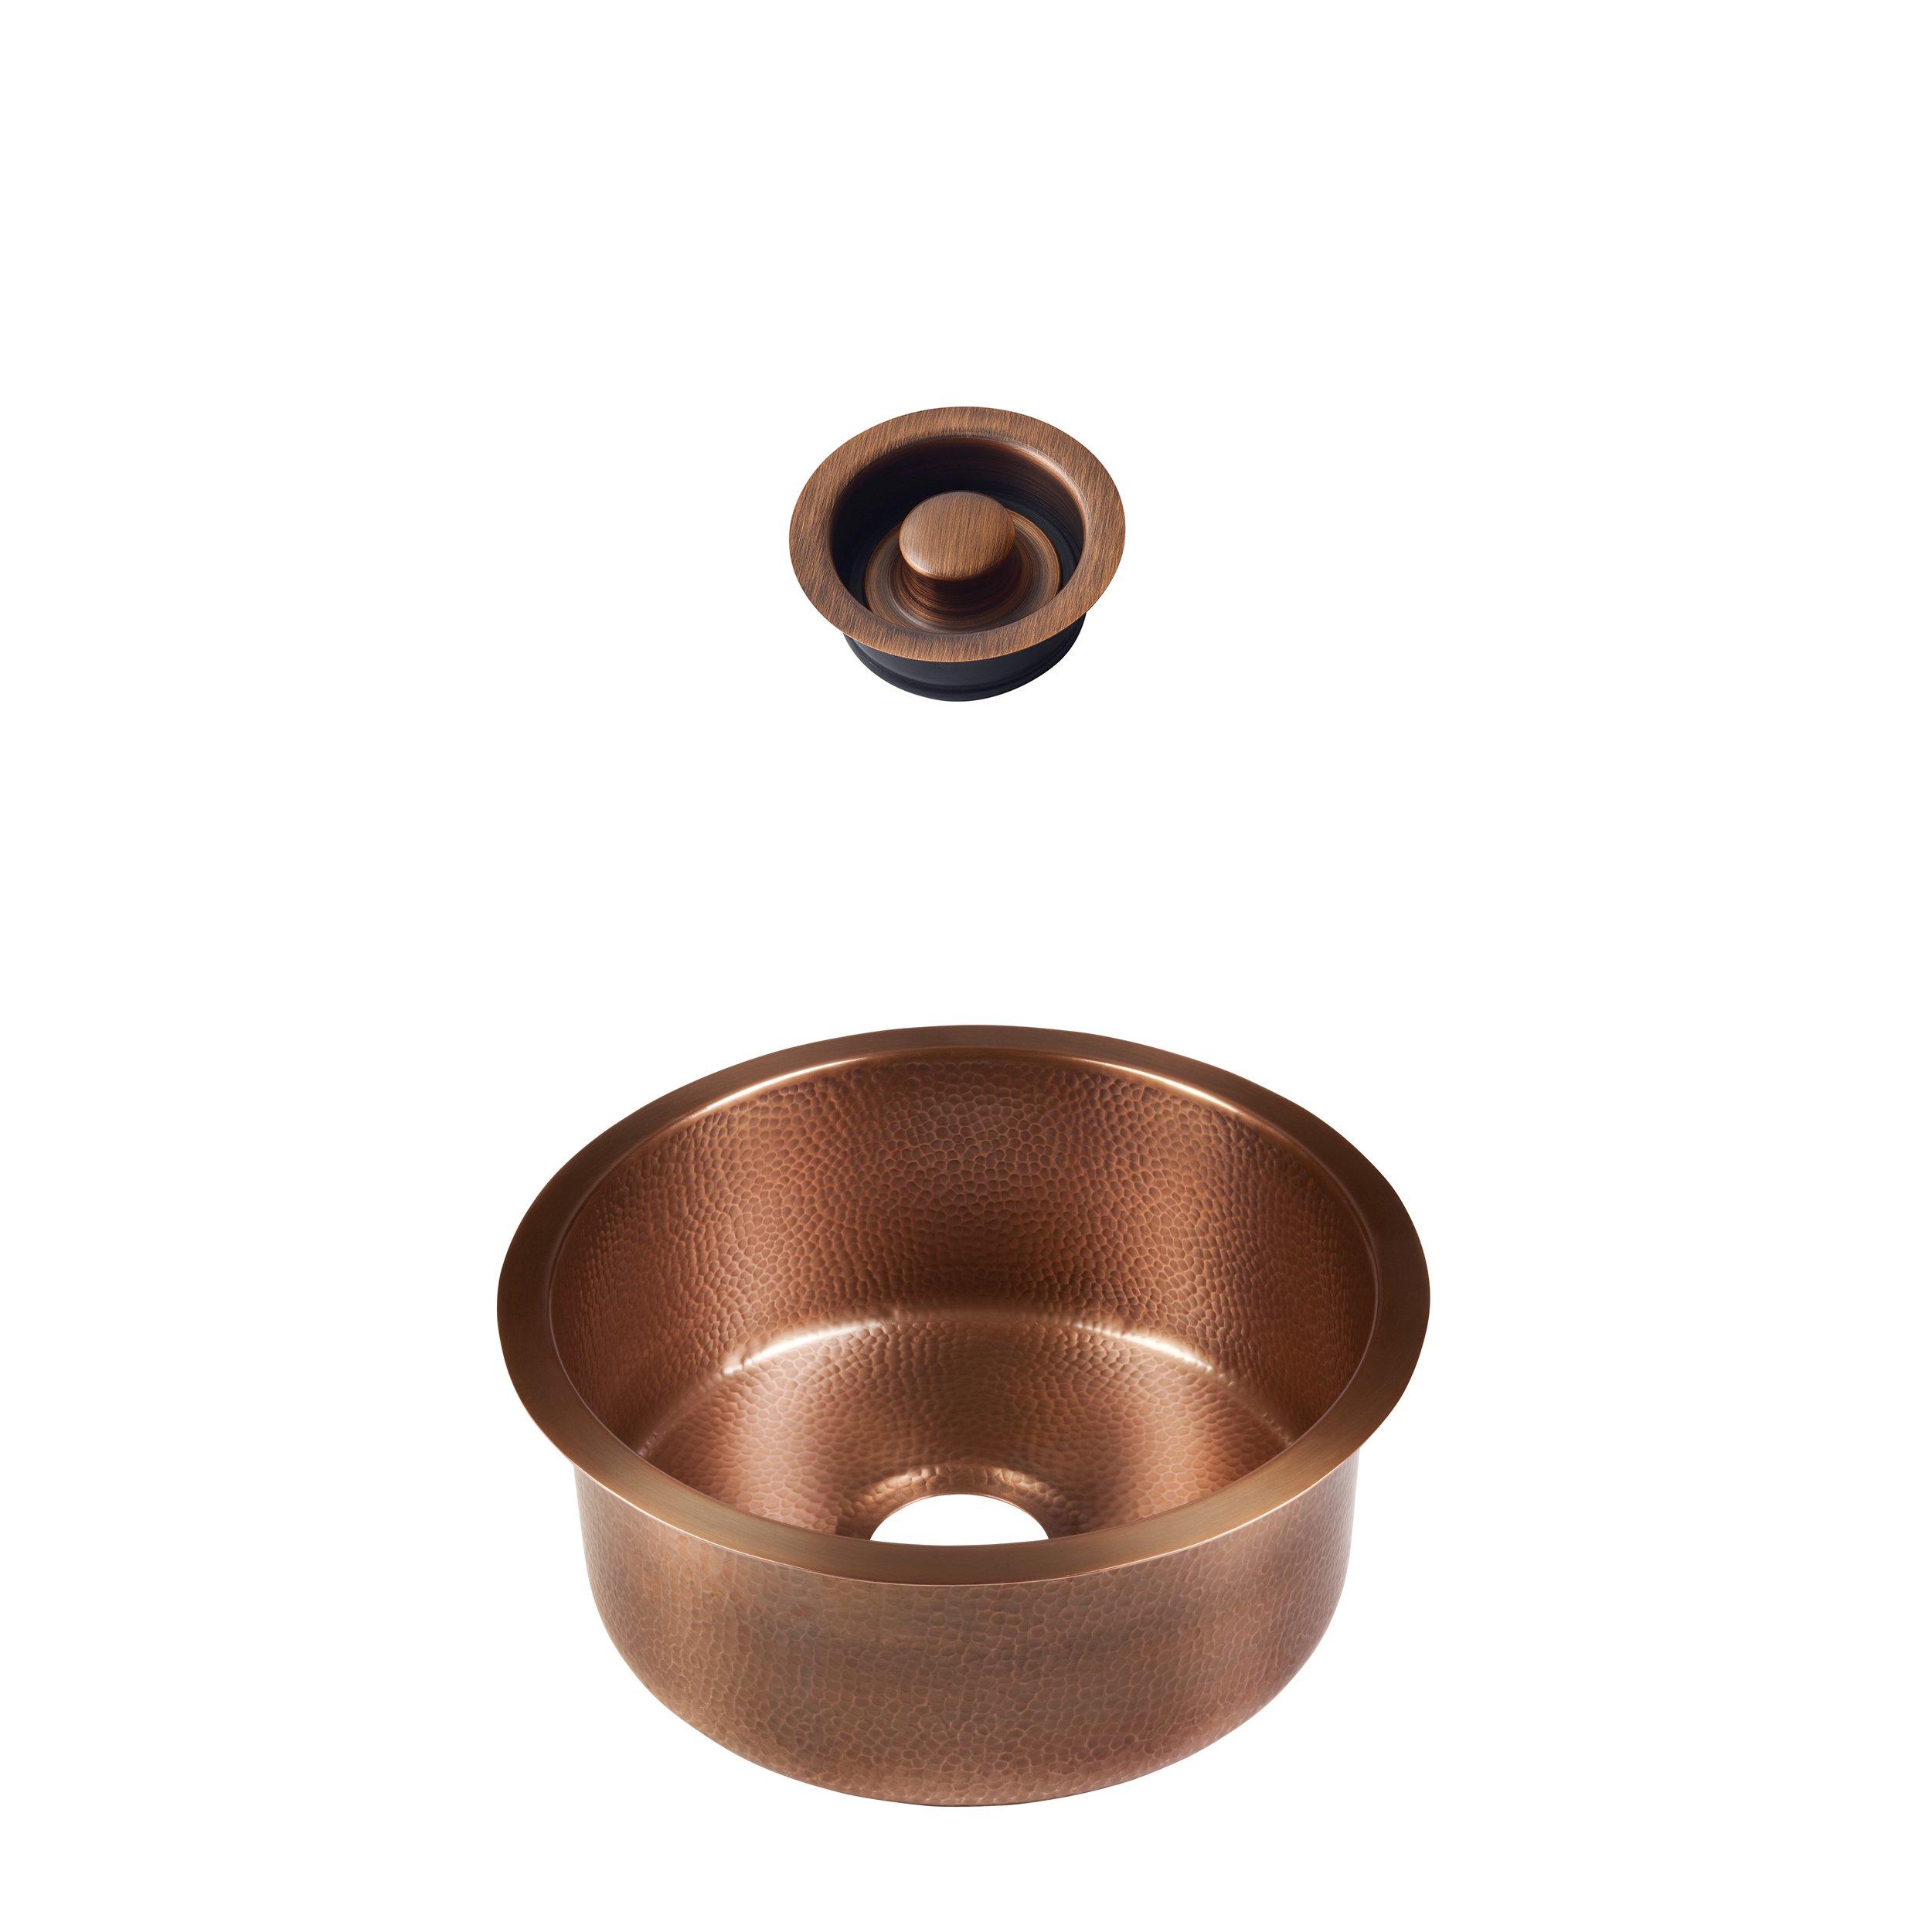 Sinkology SP504-17AC-AMZ-D Ducreux Undermount 17 in. Bar Prep Kit with Disposal Flange Copper Bathroom Sink, 17 x 17 x 8, Antique by Sinkology